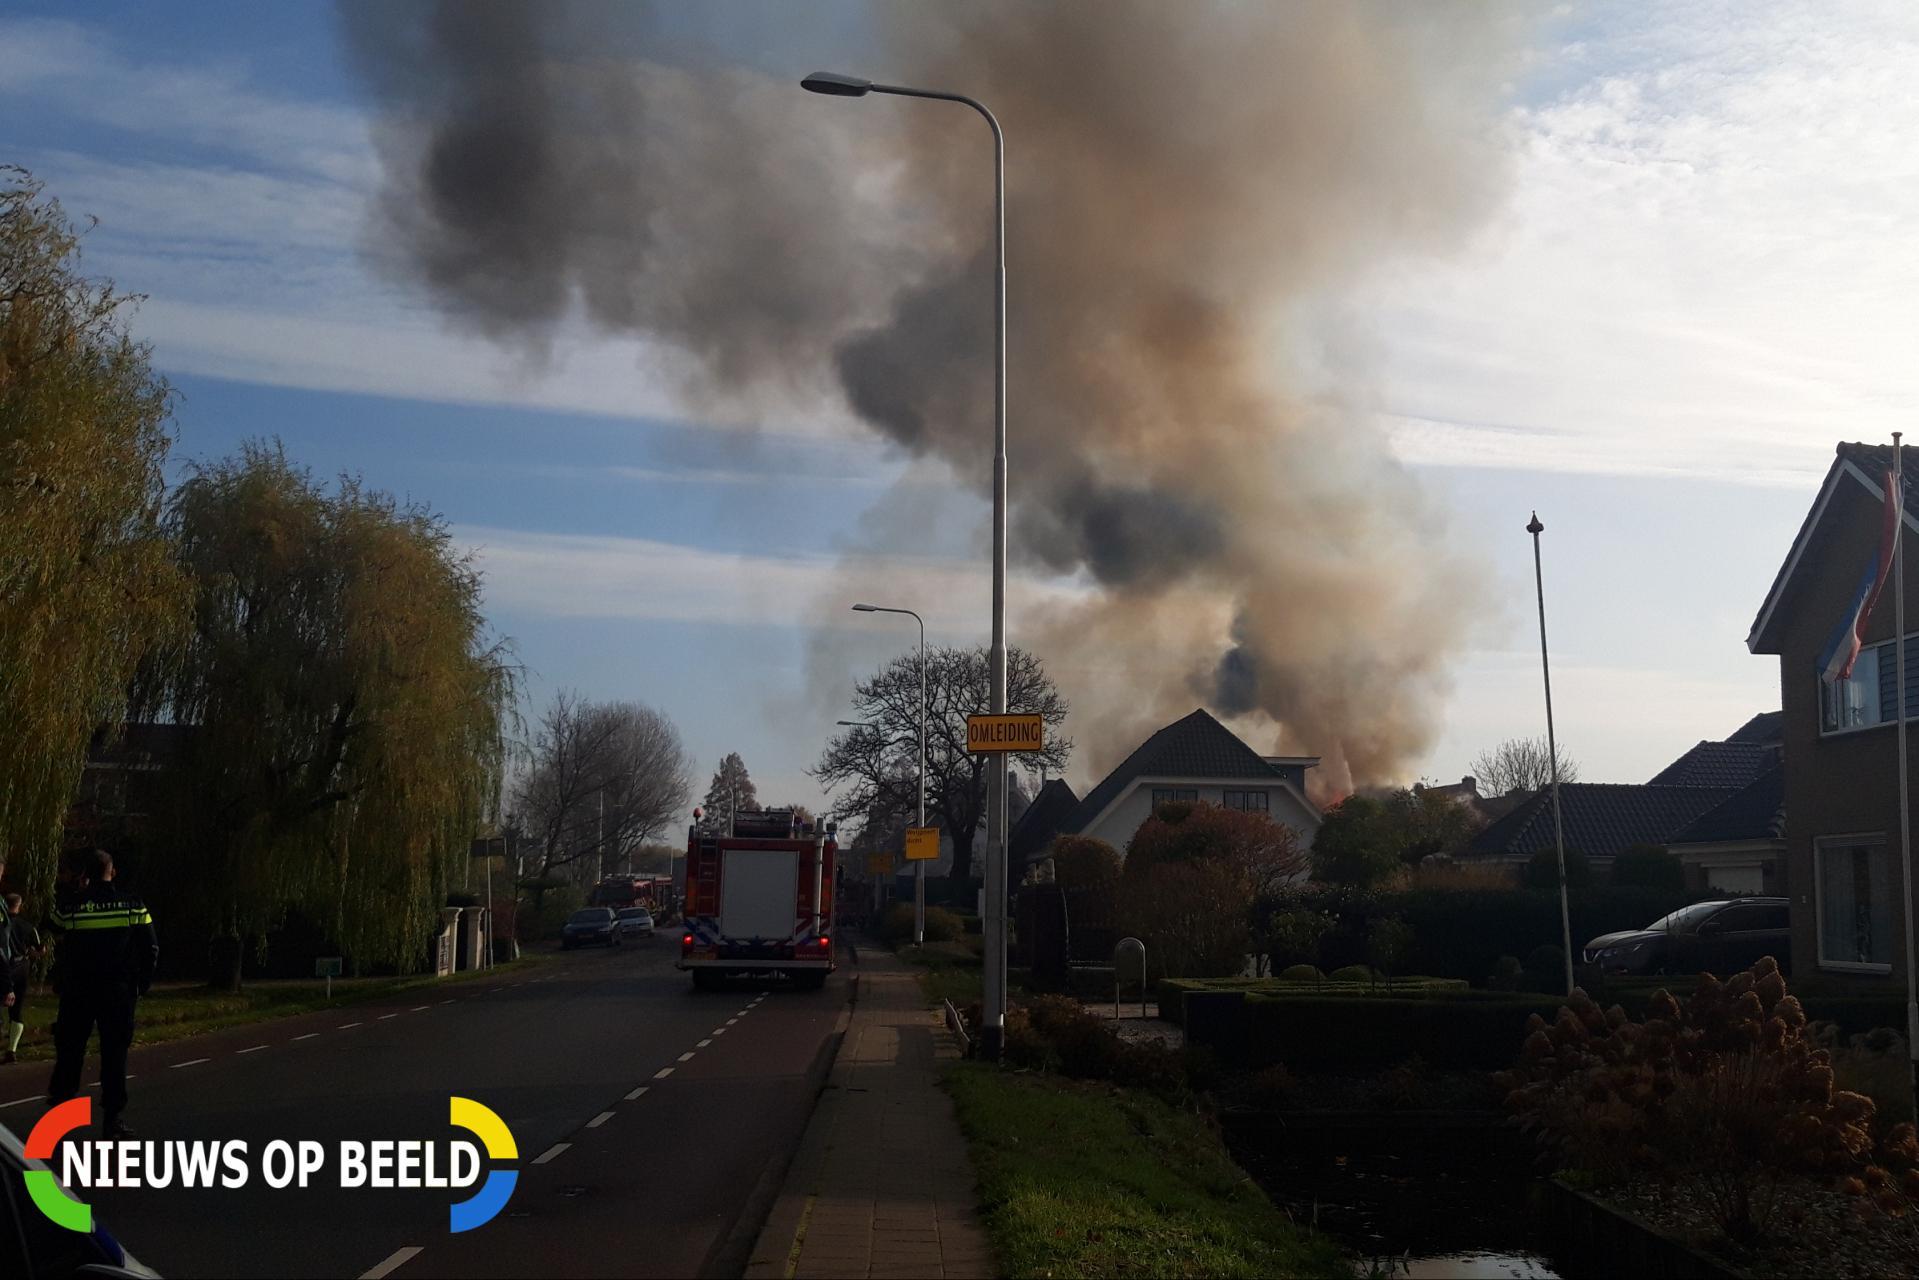 Grote brand in boerderij Noordzijde – N458 Bodegraven